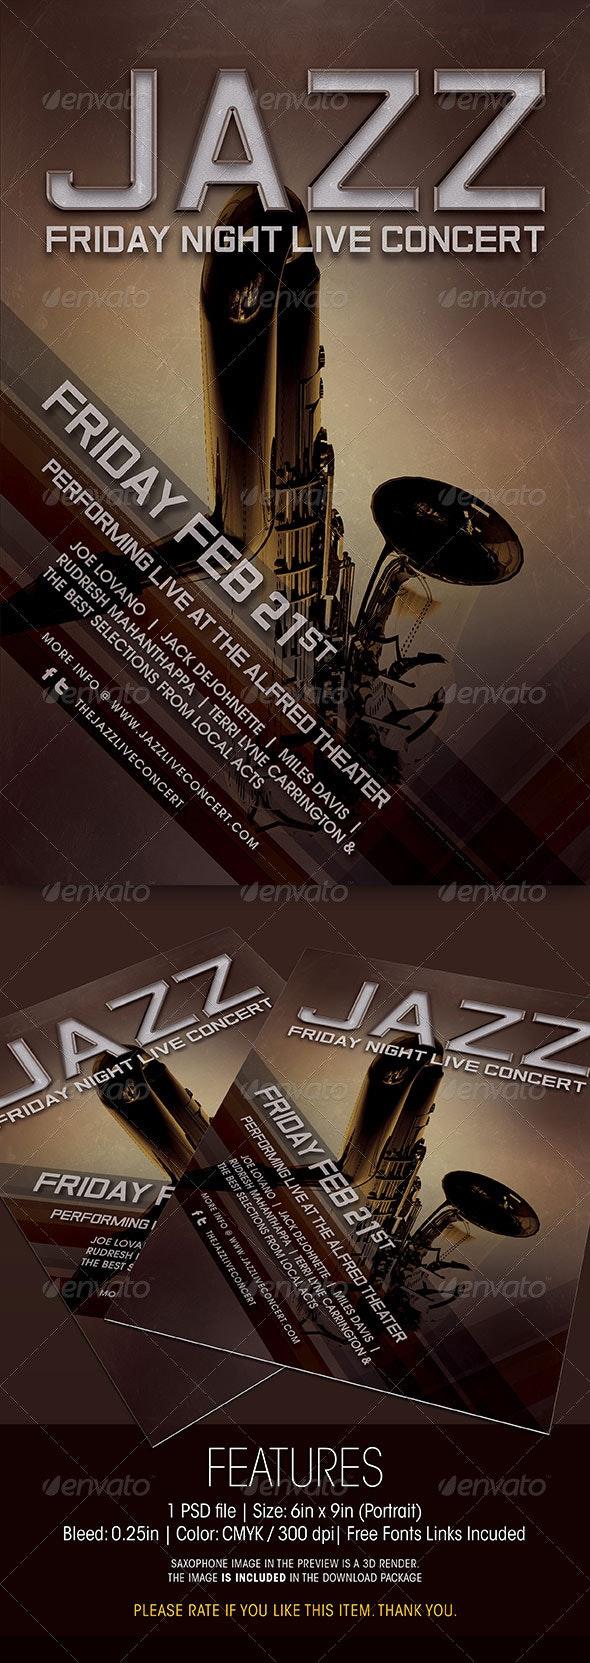 Jazz Live Concert Flyer - Concerts Events